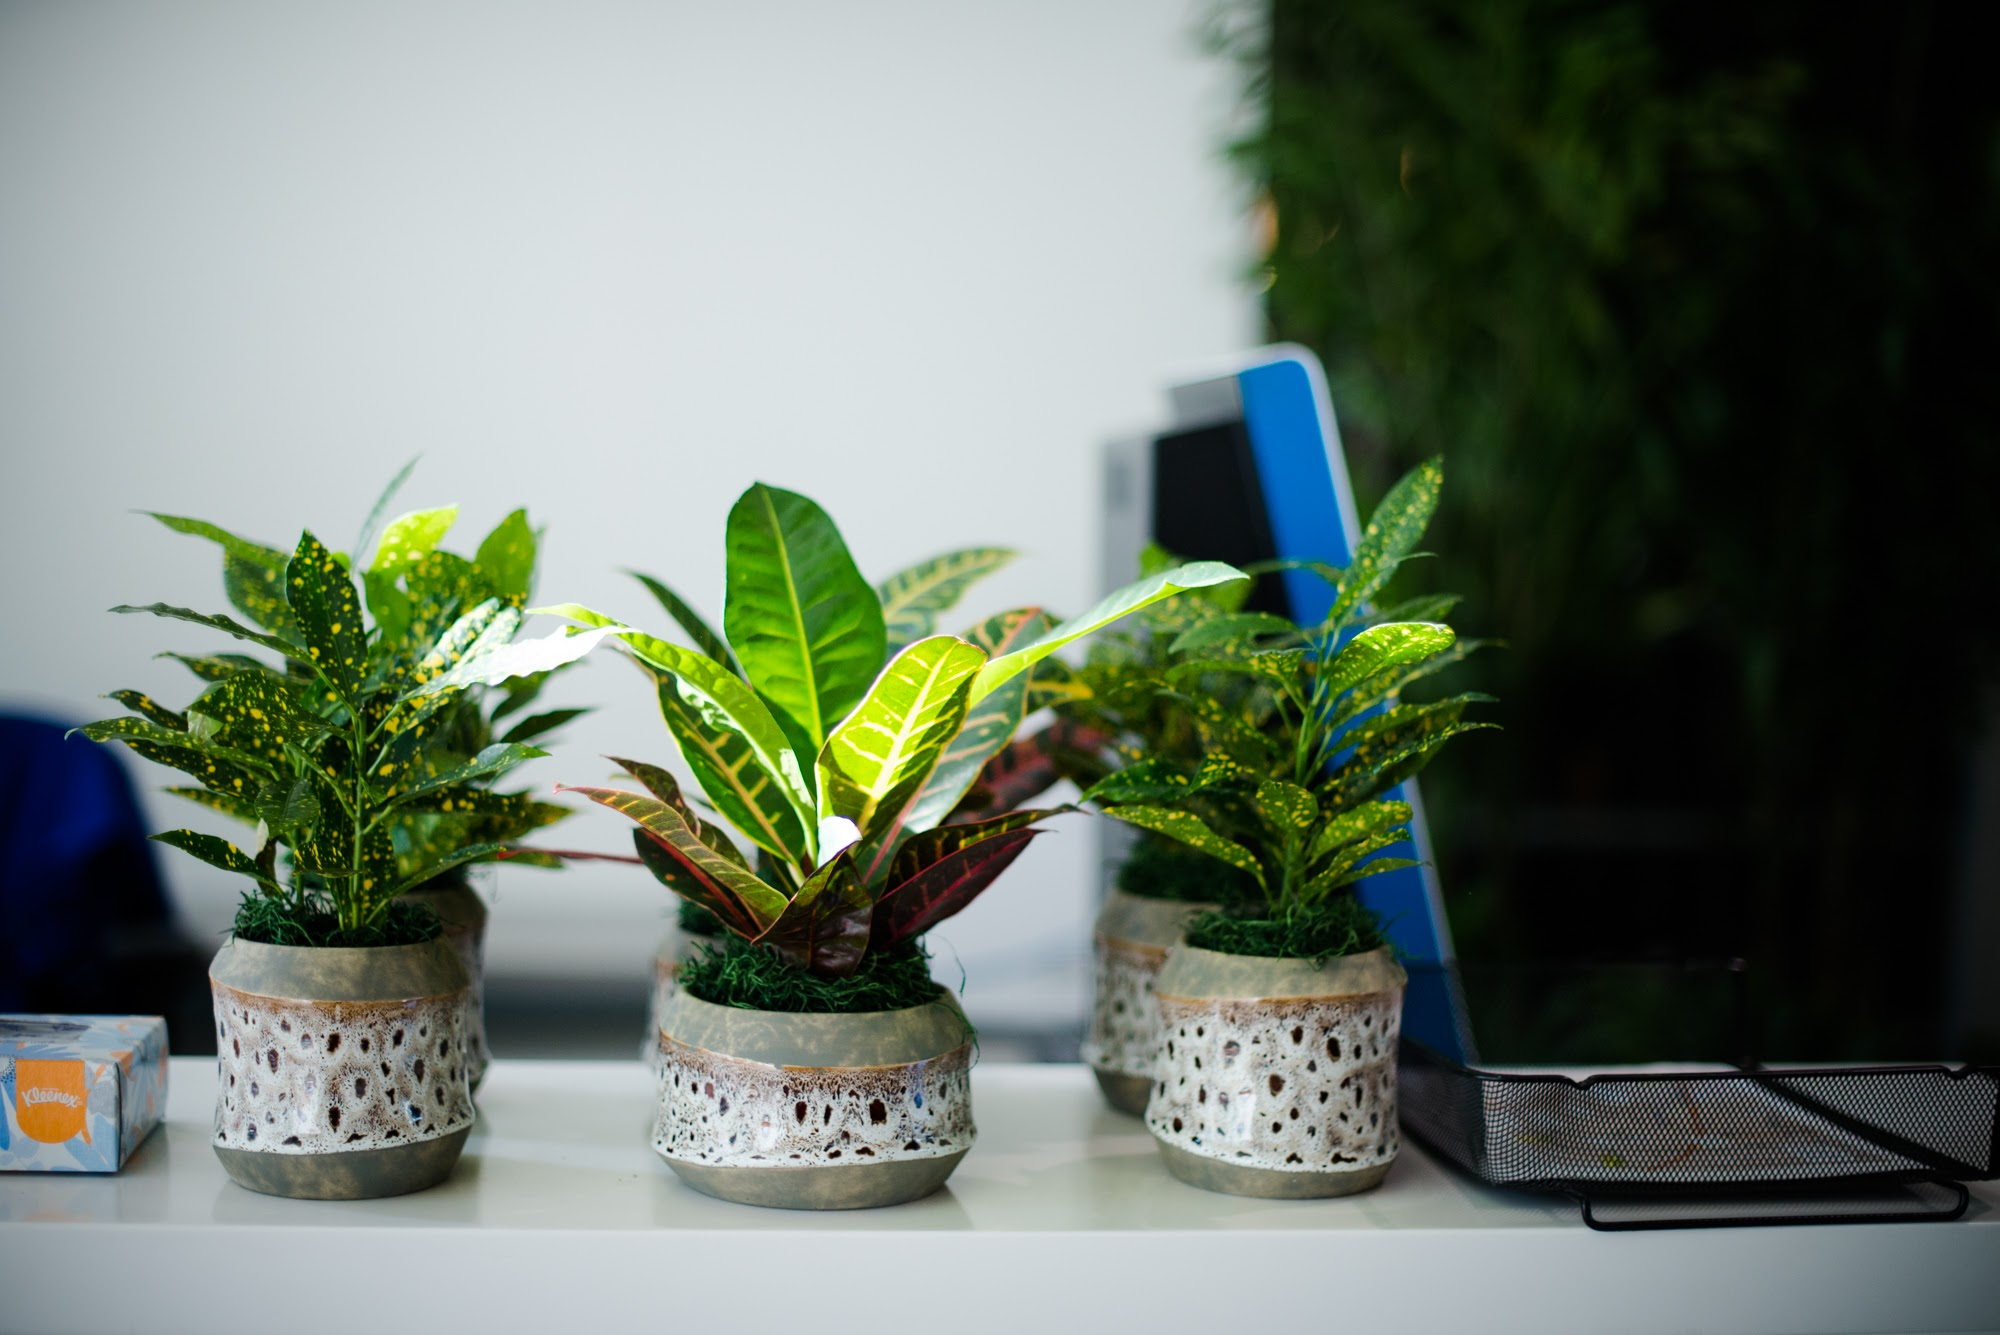 Table Top Foliage Plants.jpg